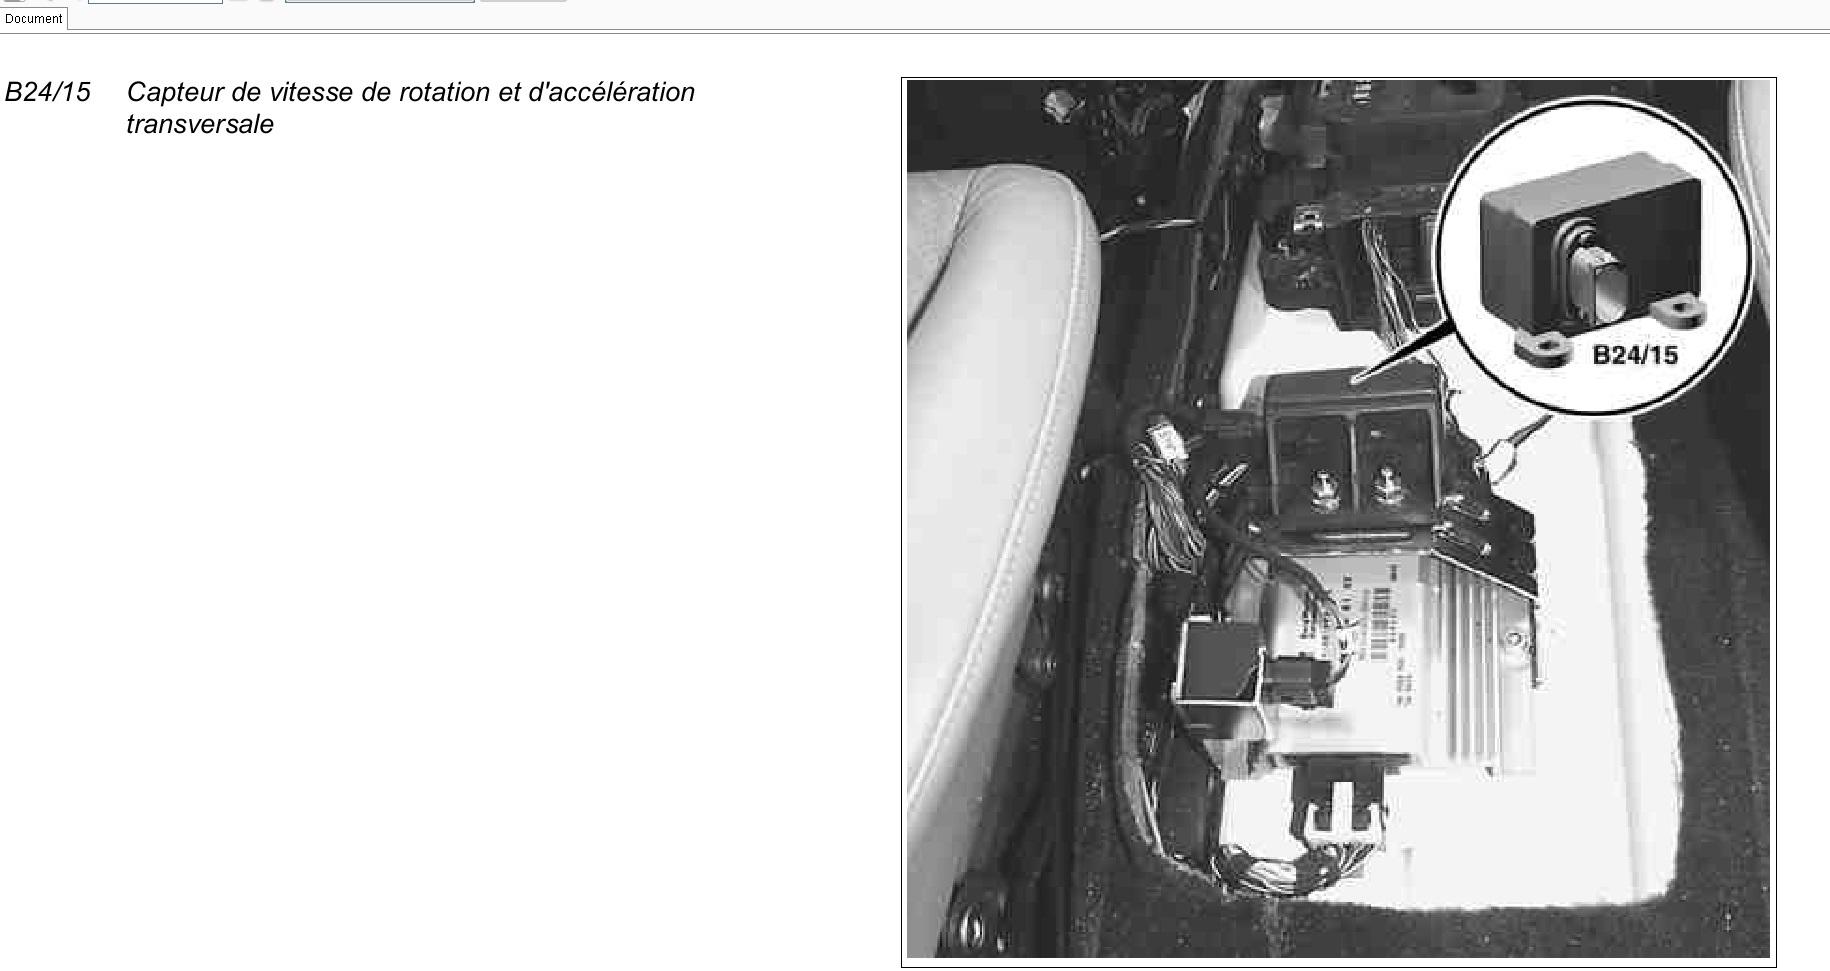 esp-capteur-de-vitesse-rotation-2-WDC1631131X760371.jpg